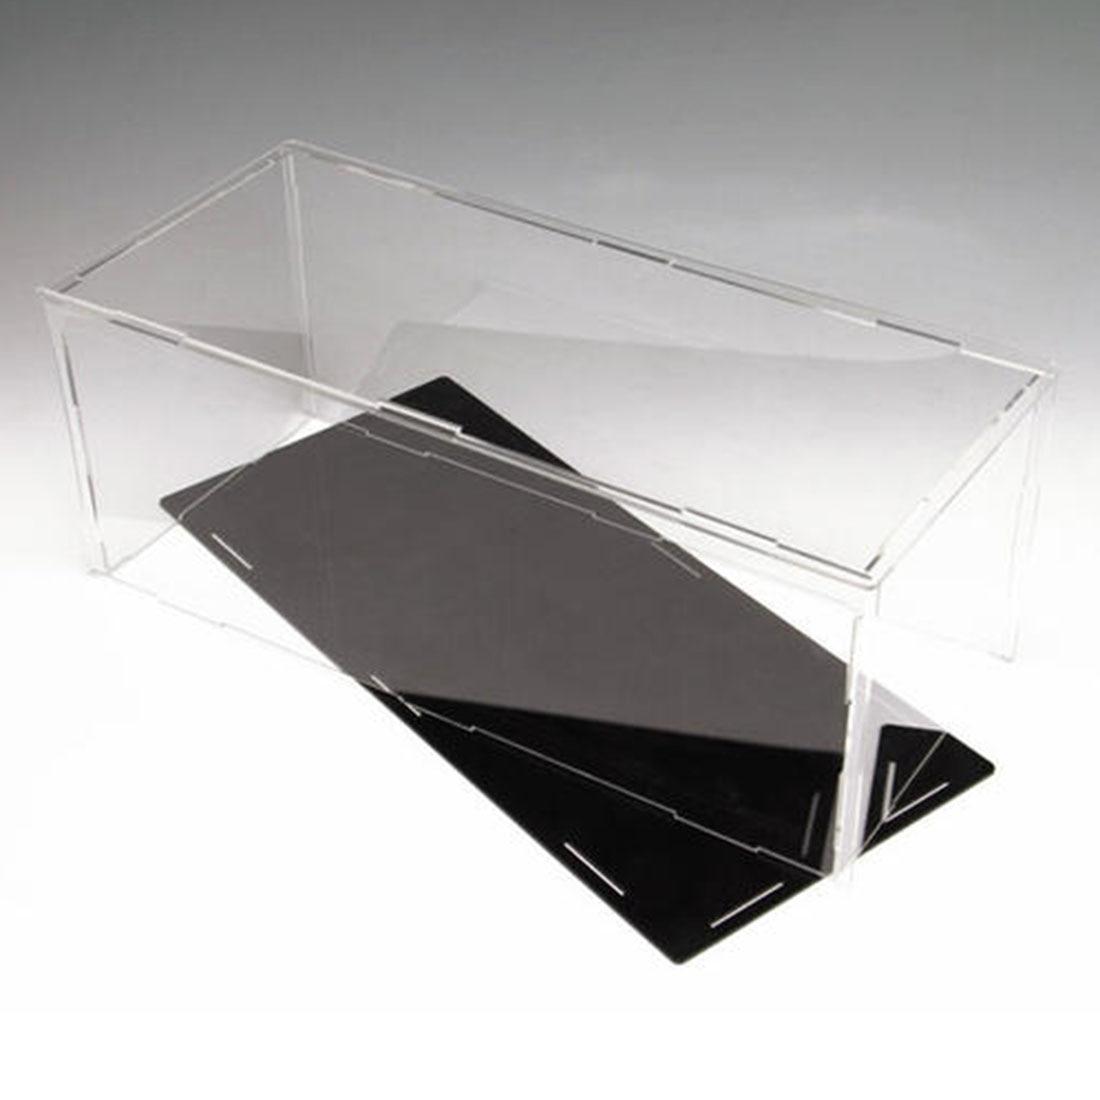 36 6x26 6x15 6cm bloco de construcao acrilico dustproof exibir mostrar caixa para amigos cafe 21319